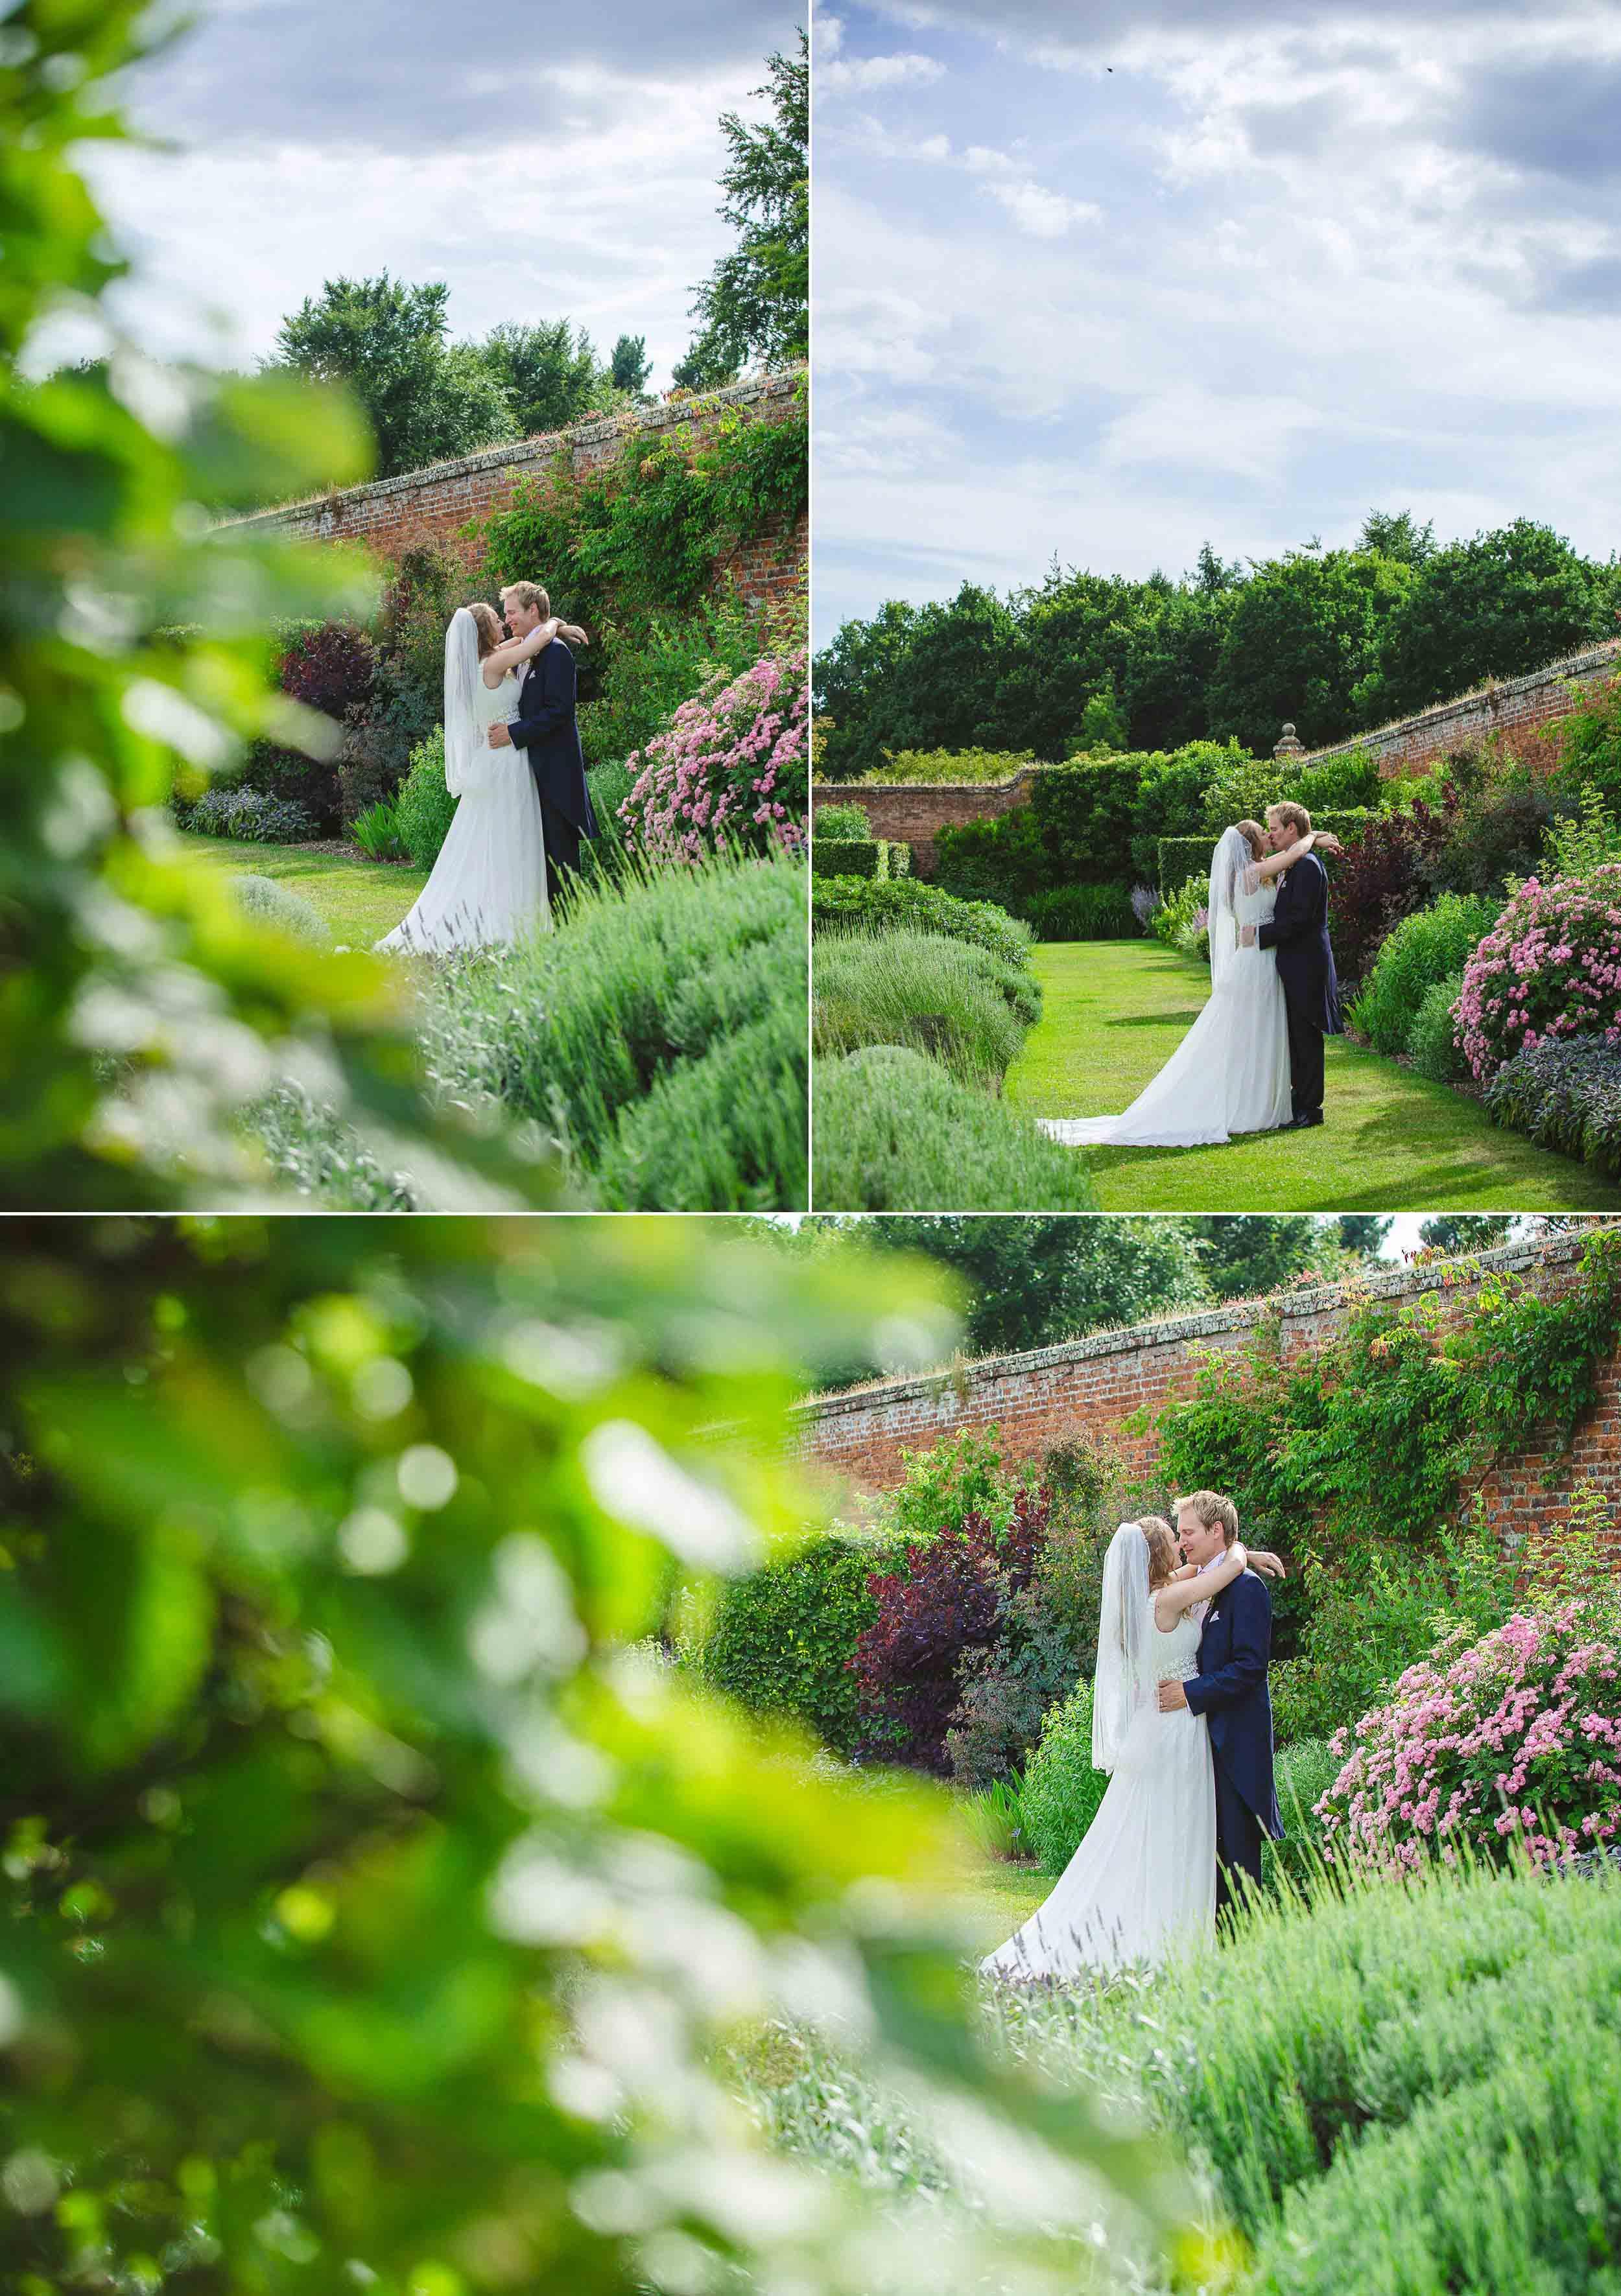 Marks-Hall-Wedding-Photographer-47.jpg